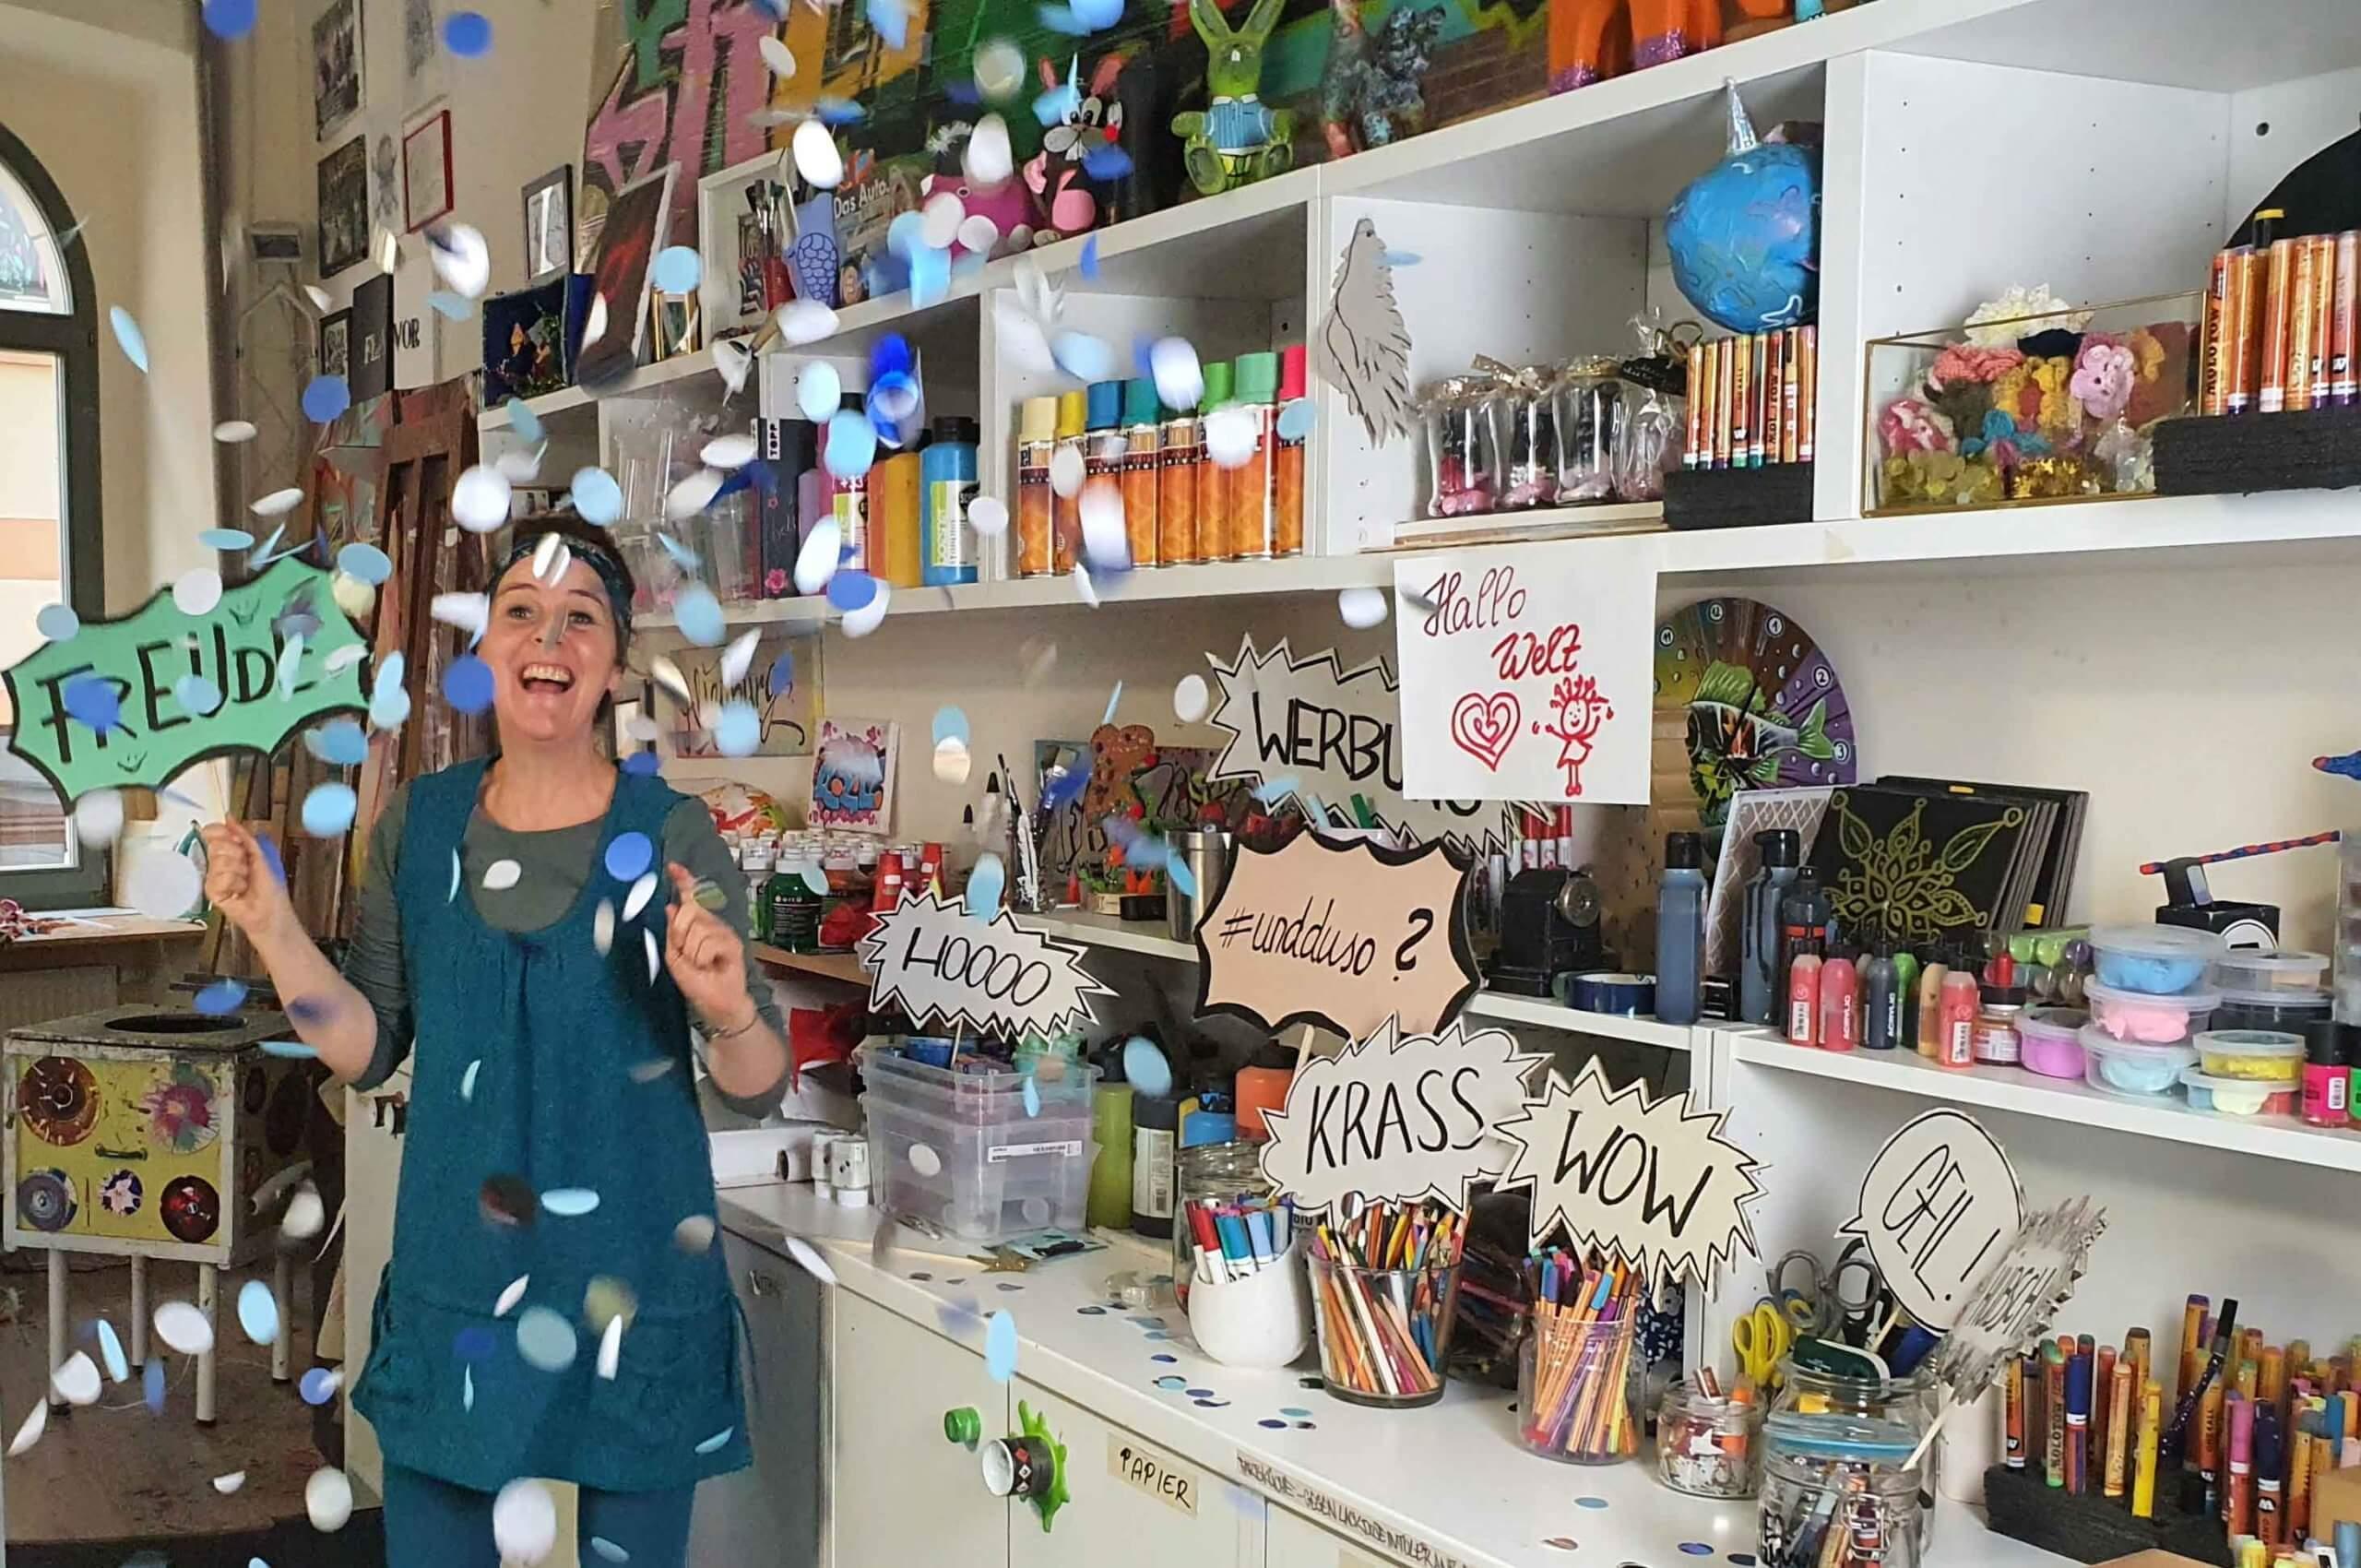 Yvonne Ammer freut sich riesig, Foto: Maike Steuer